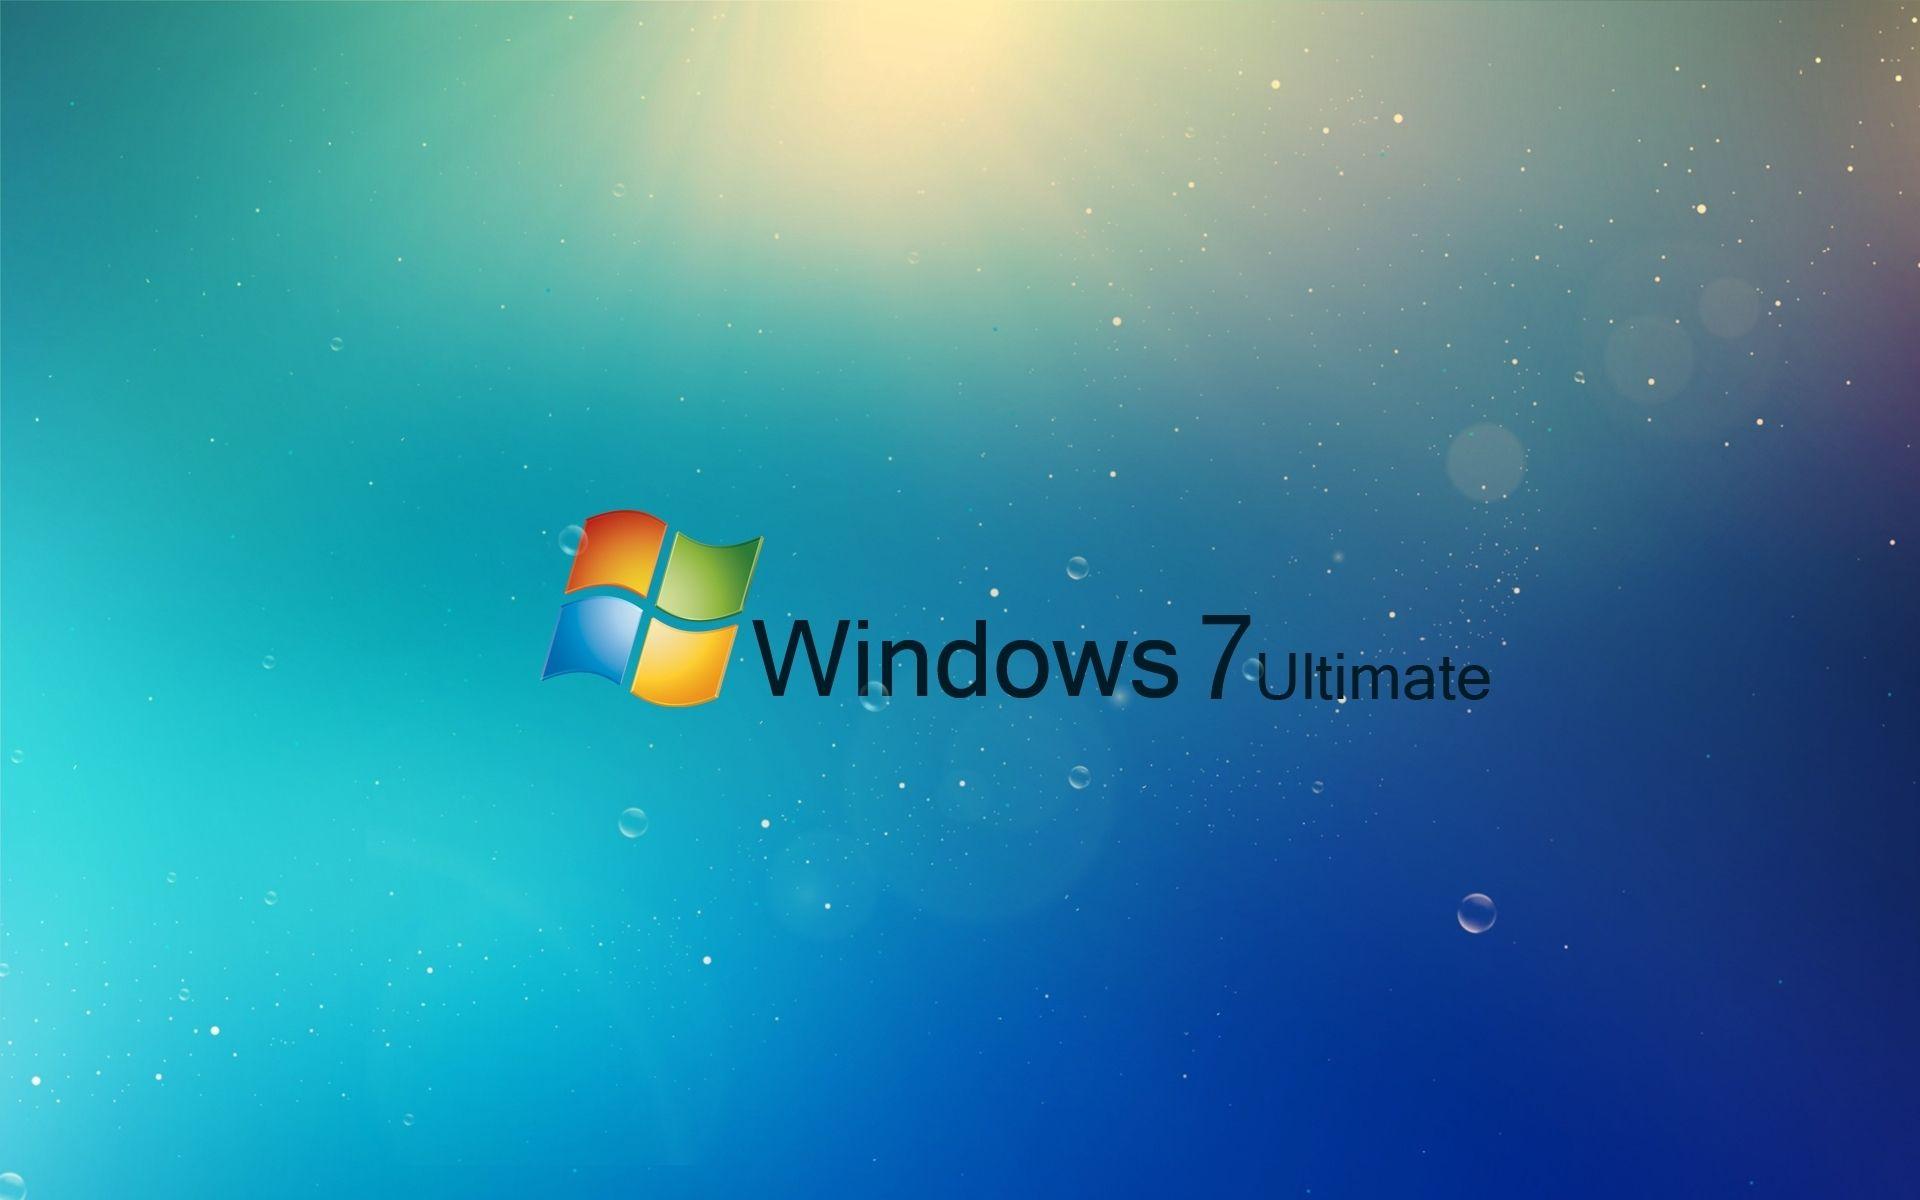 Windows 7 ultimate desktop background   SF Wallpaper 1920x1200